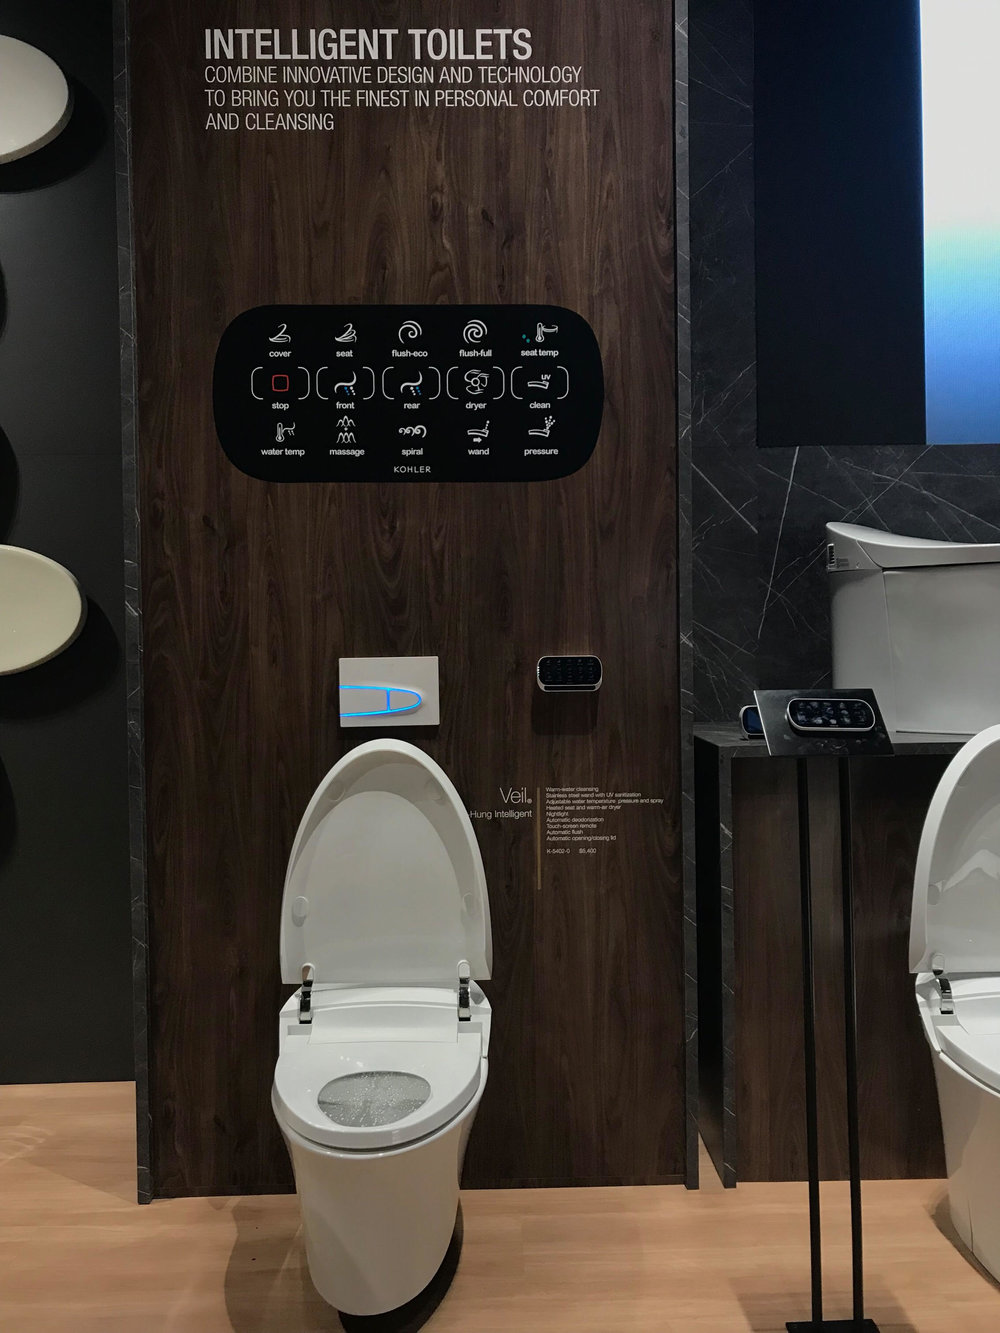 Kohler Intelligent Toilets, KBIS 2018, Bathroom Trends, BlogTour, Nyla Free Designs, Calgary Interior Designer, #designhounds